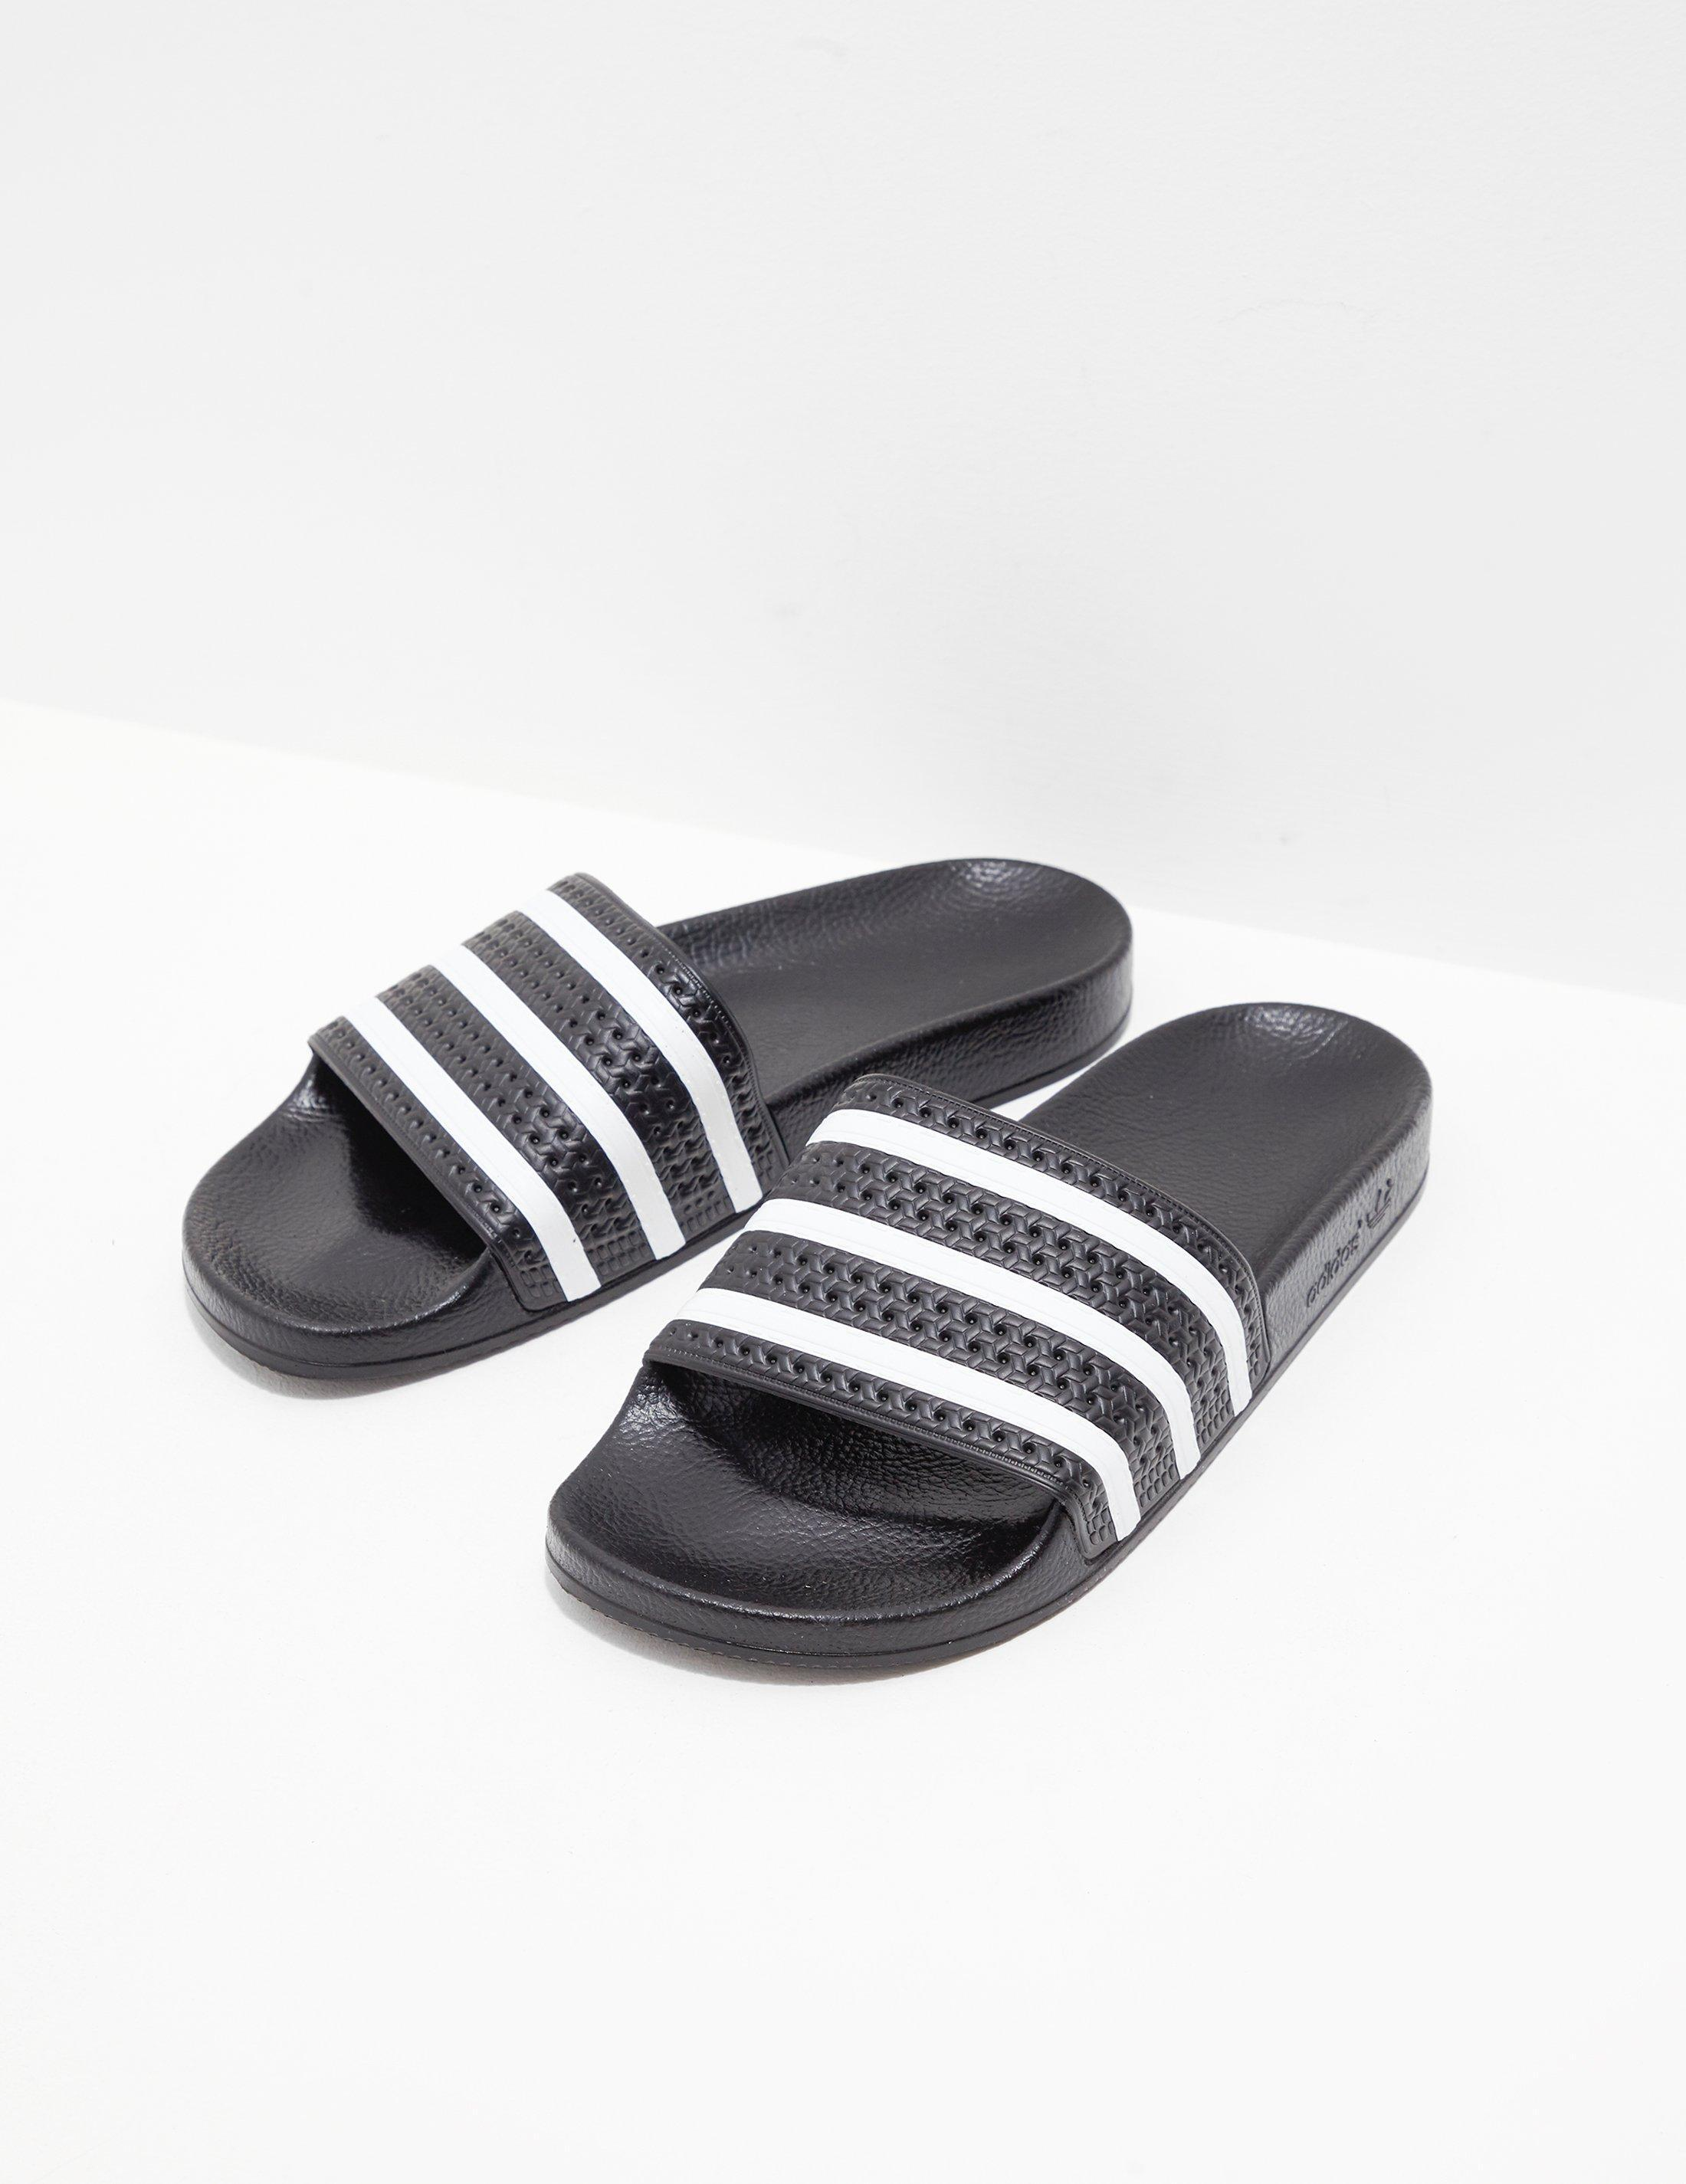 ab6db916f0b66 adidas Originals Mens Adilette Slides Black in Black for Men - Lyst